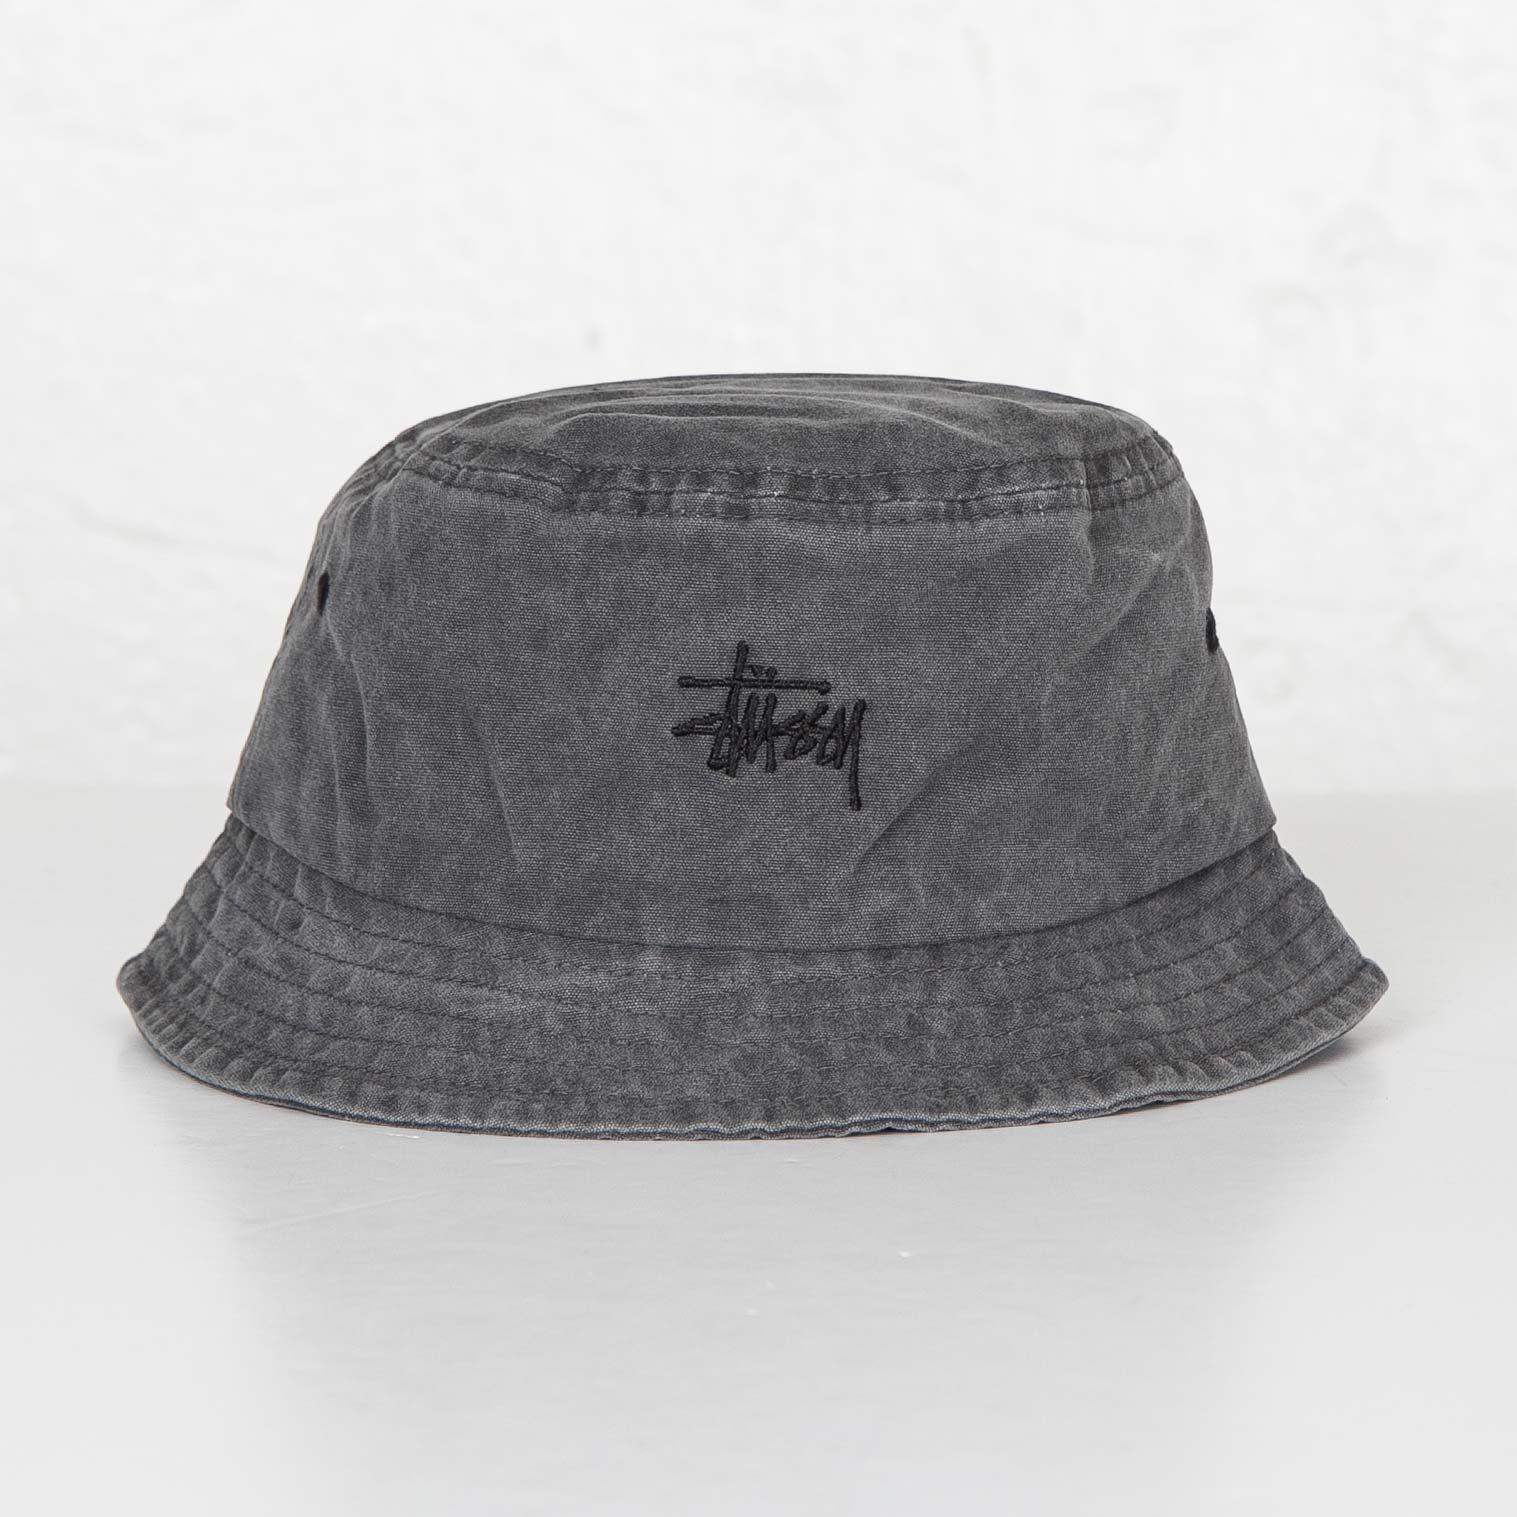 70623028200 Stussy Bucket Hat - 132753-0001 - Sneakersnstuff